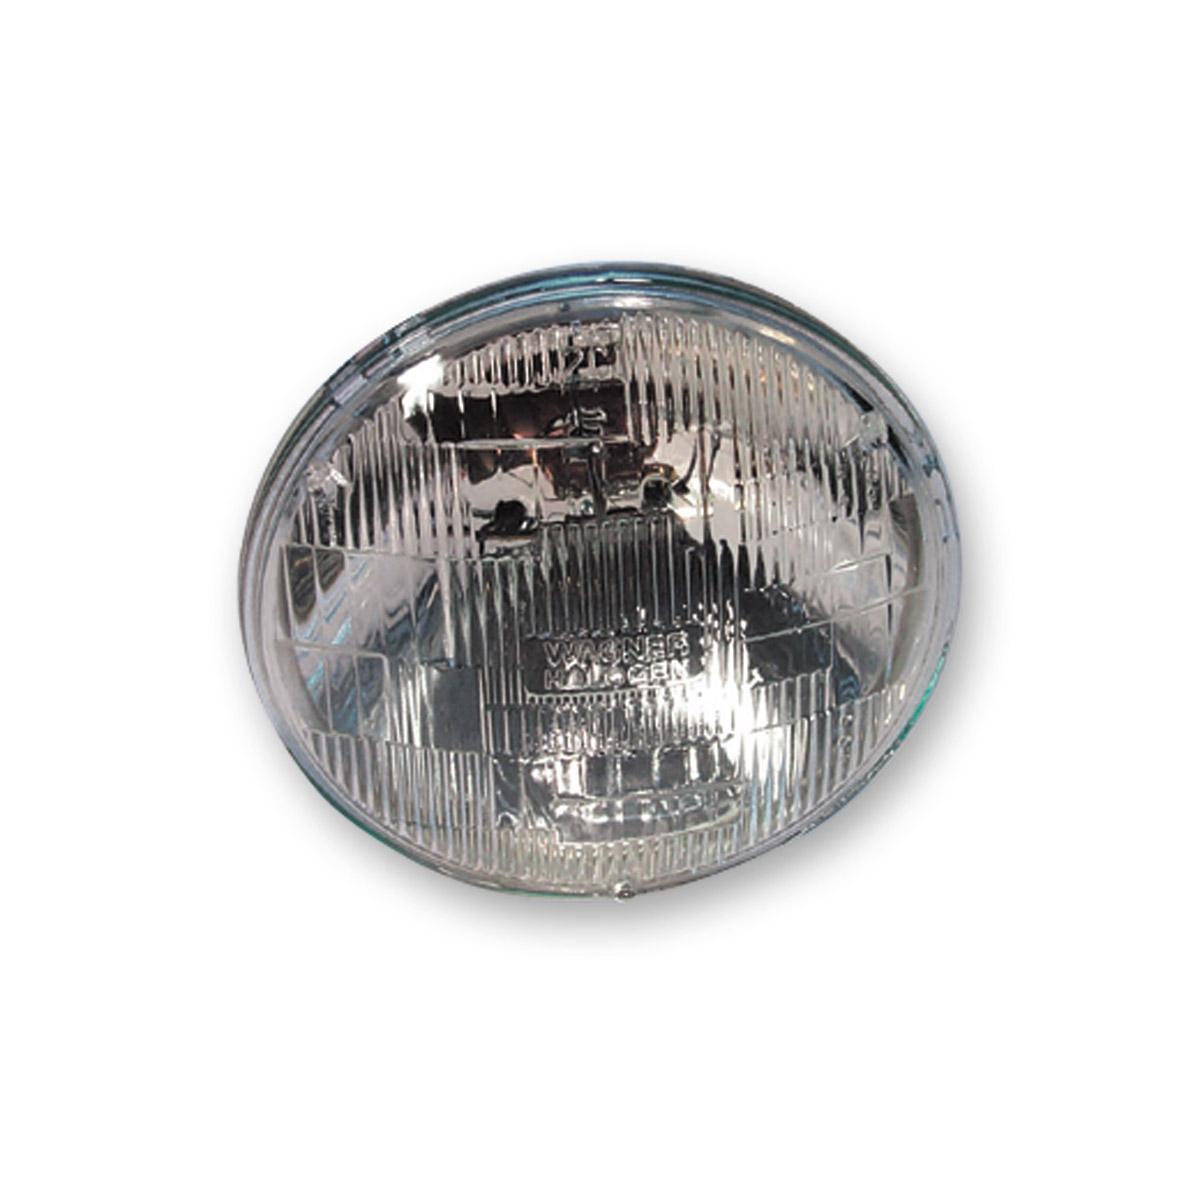 J&P Cycles® 5-3/4″ 12 Volt Replacement Headlight Bulb